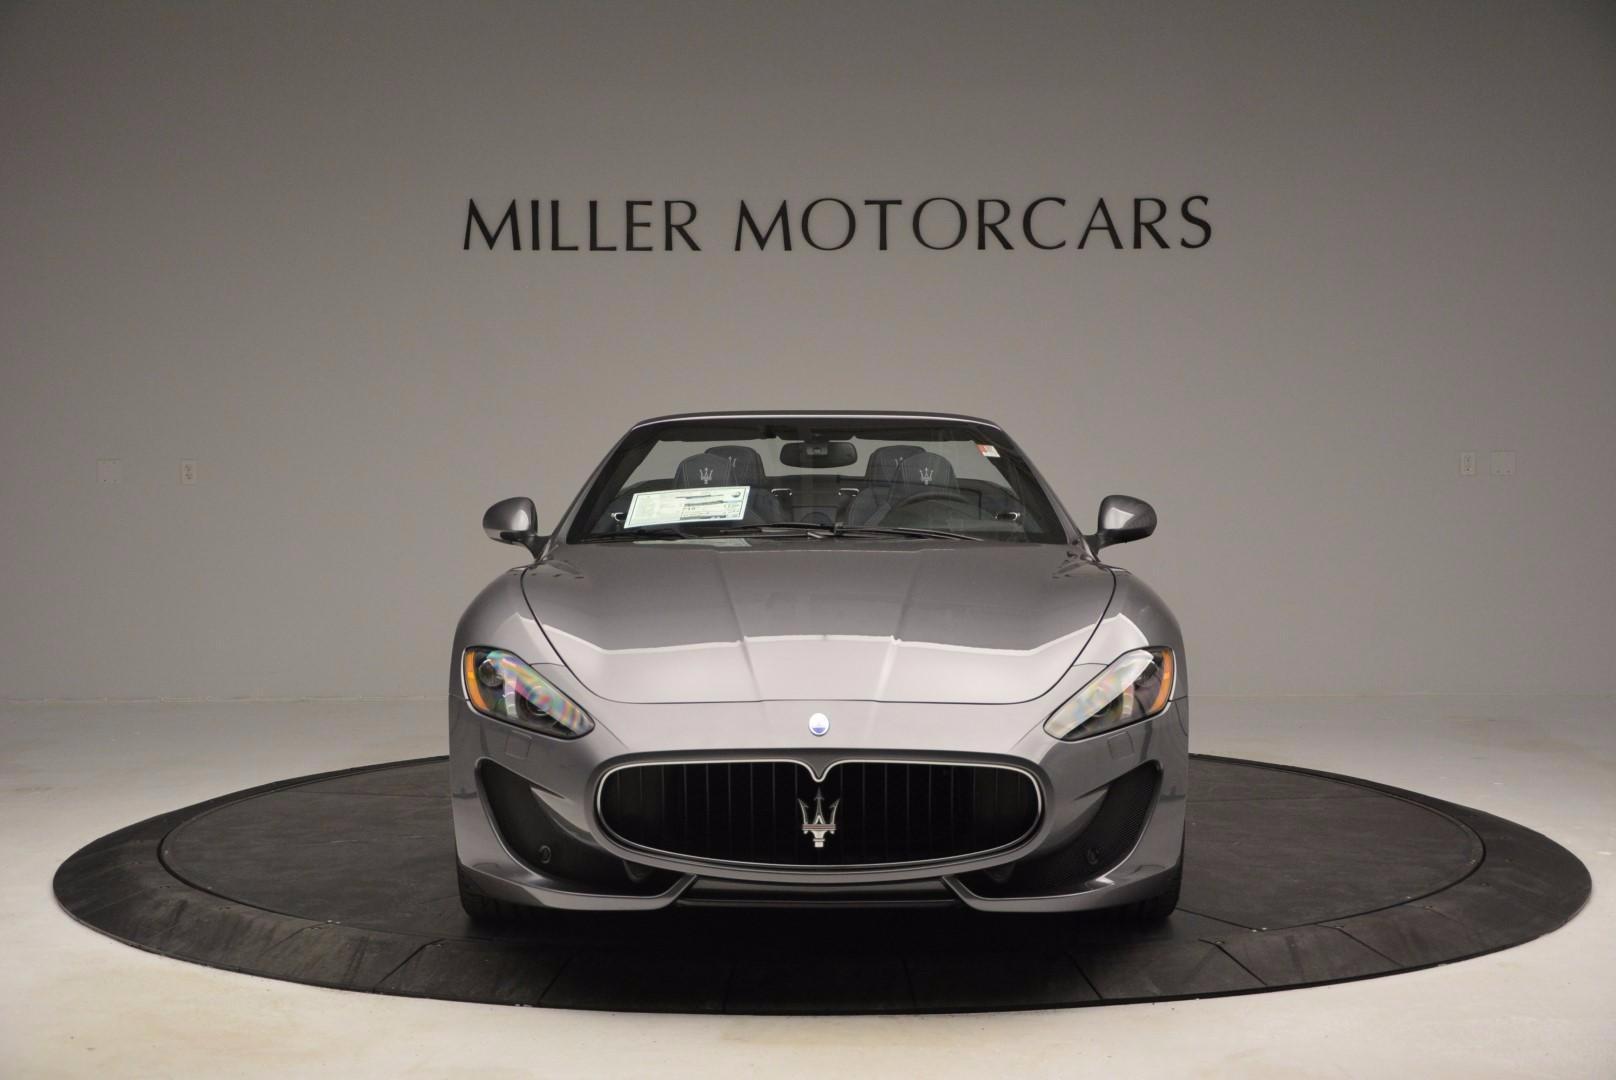 New 2016 Maserati GranTurismo Convertible Sport For Sale In Westport, CT 154_p9